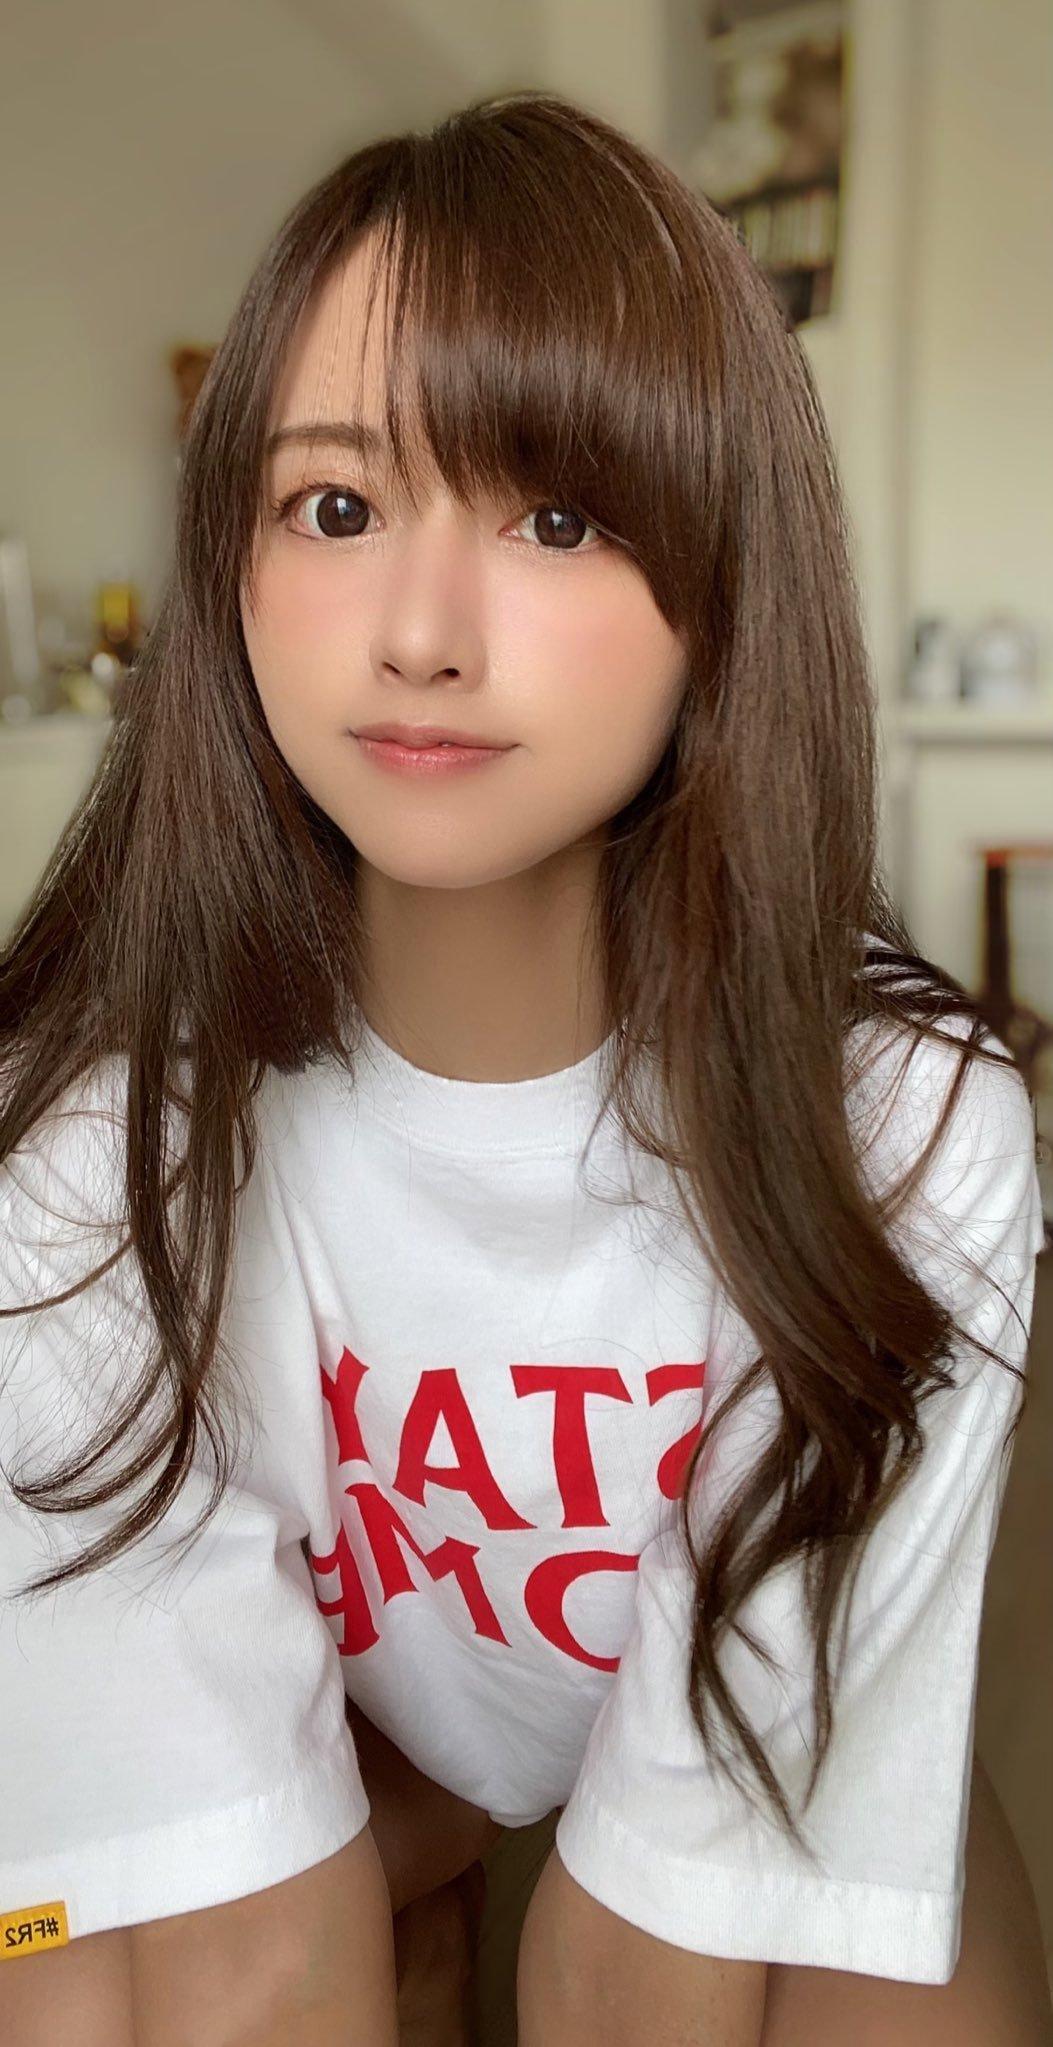 真岛爱理airi_kijima 1264873302809407490_p1